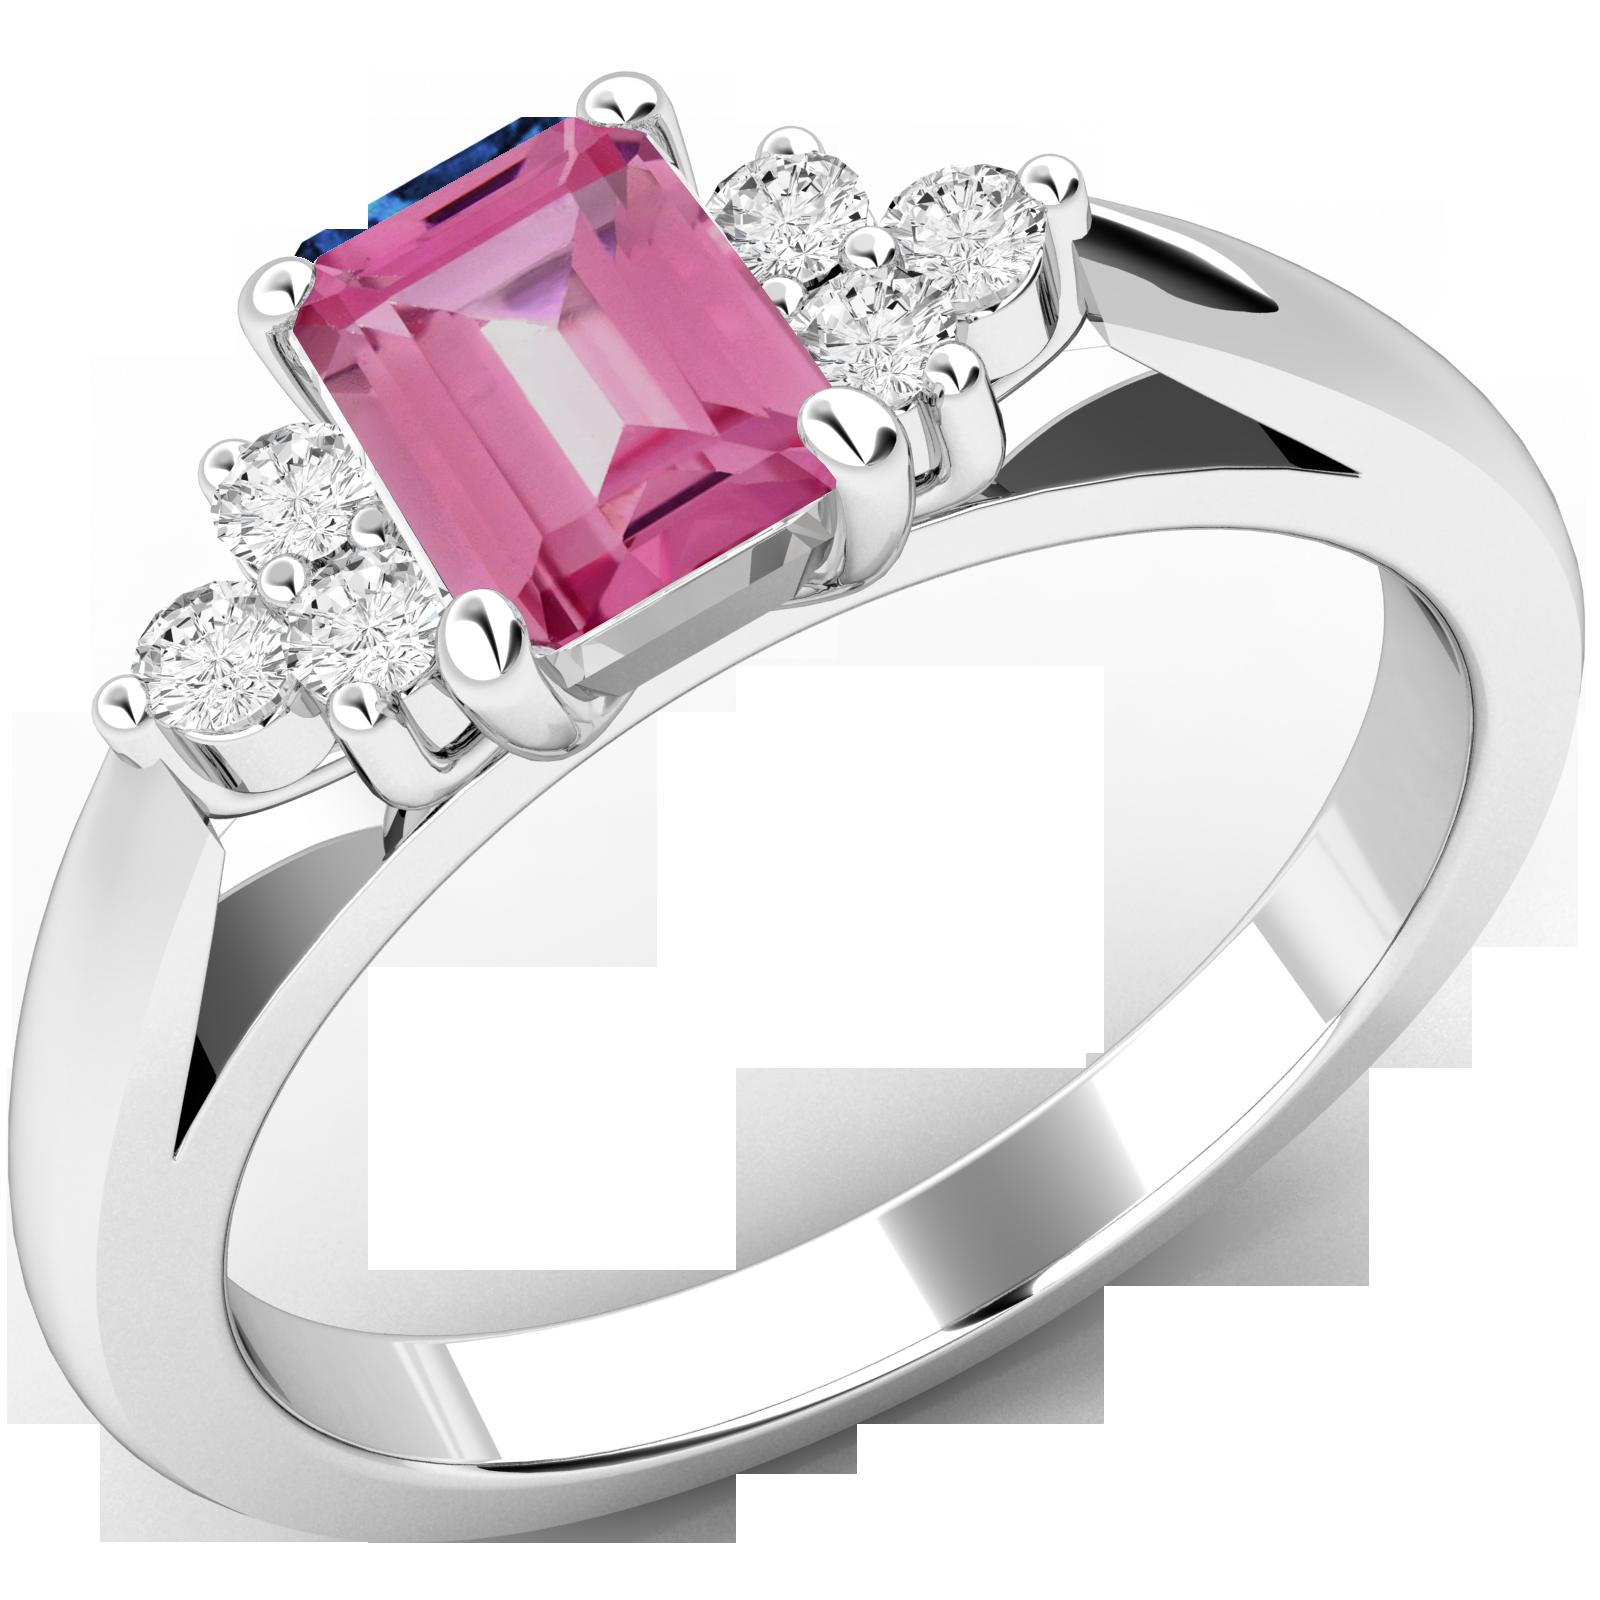 Inel cu Safir Roz si Diamant Dama Aur Alb 18kt cu un Safir Roz Forma Smarald si Diamante Rotunde-img1